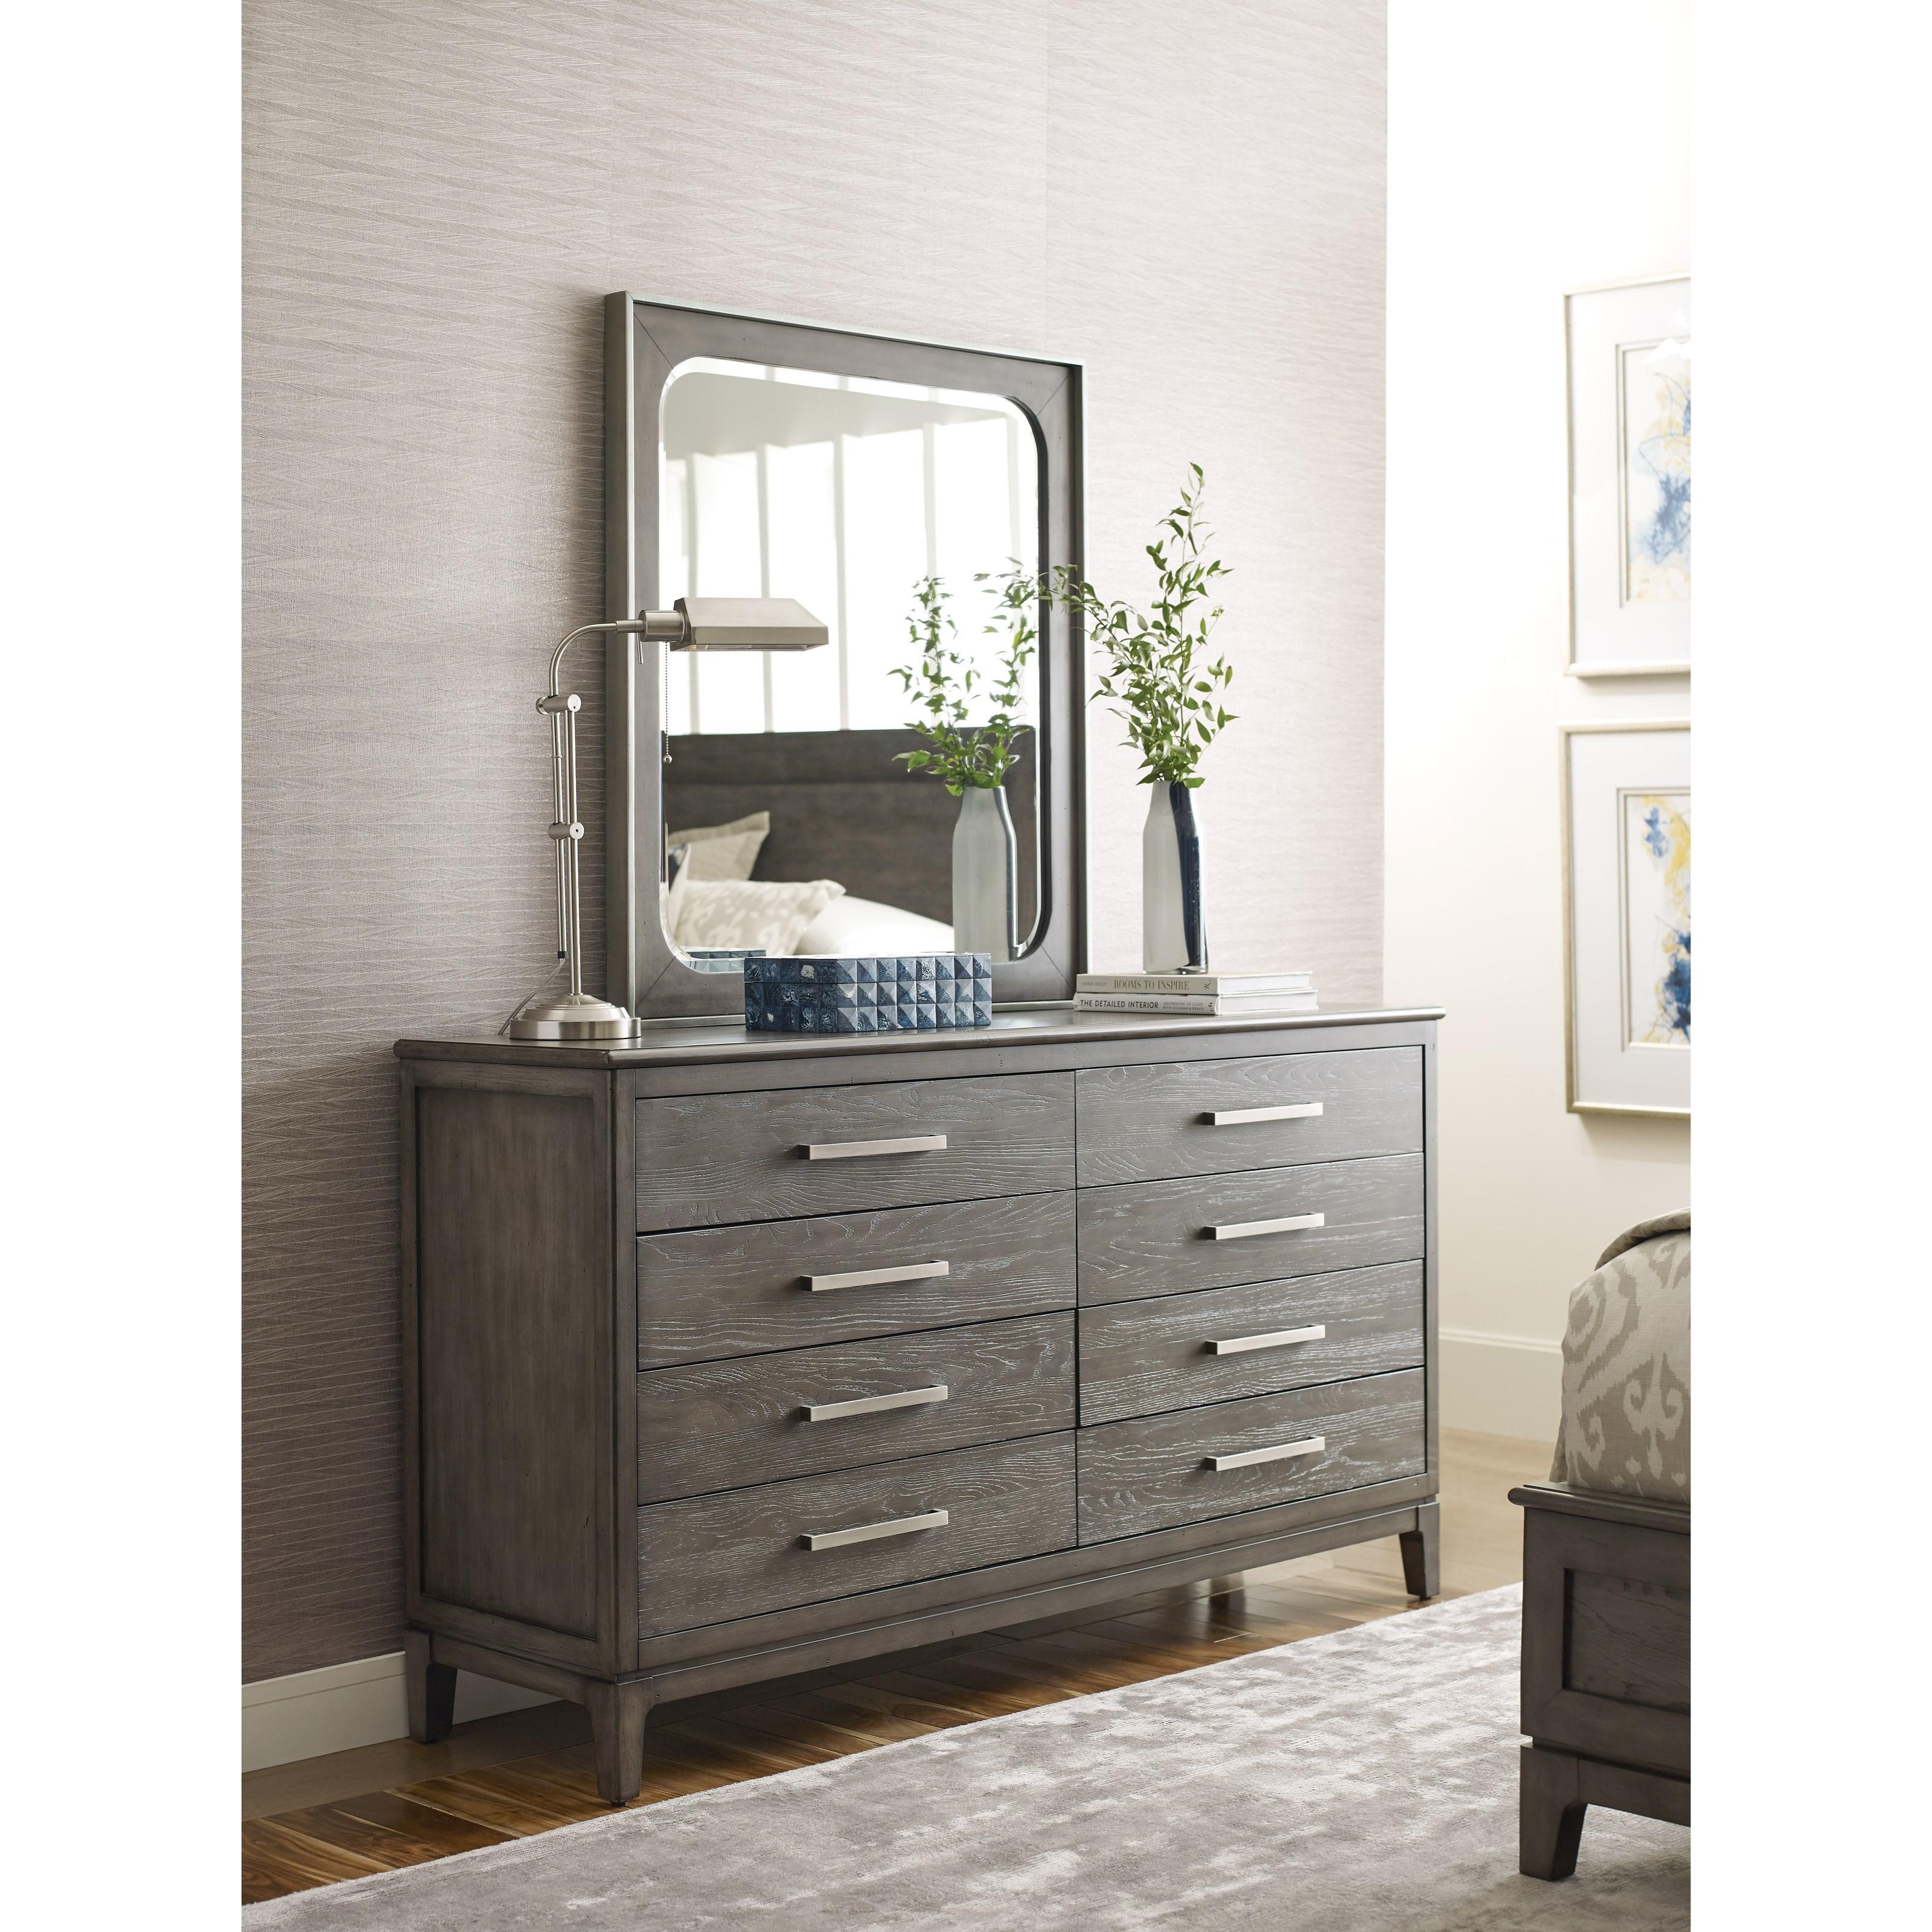 Sellers Drawer Dresser and Mirror Set